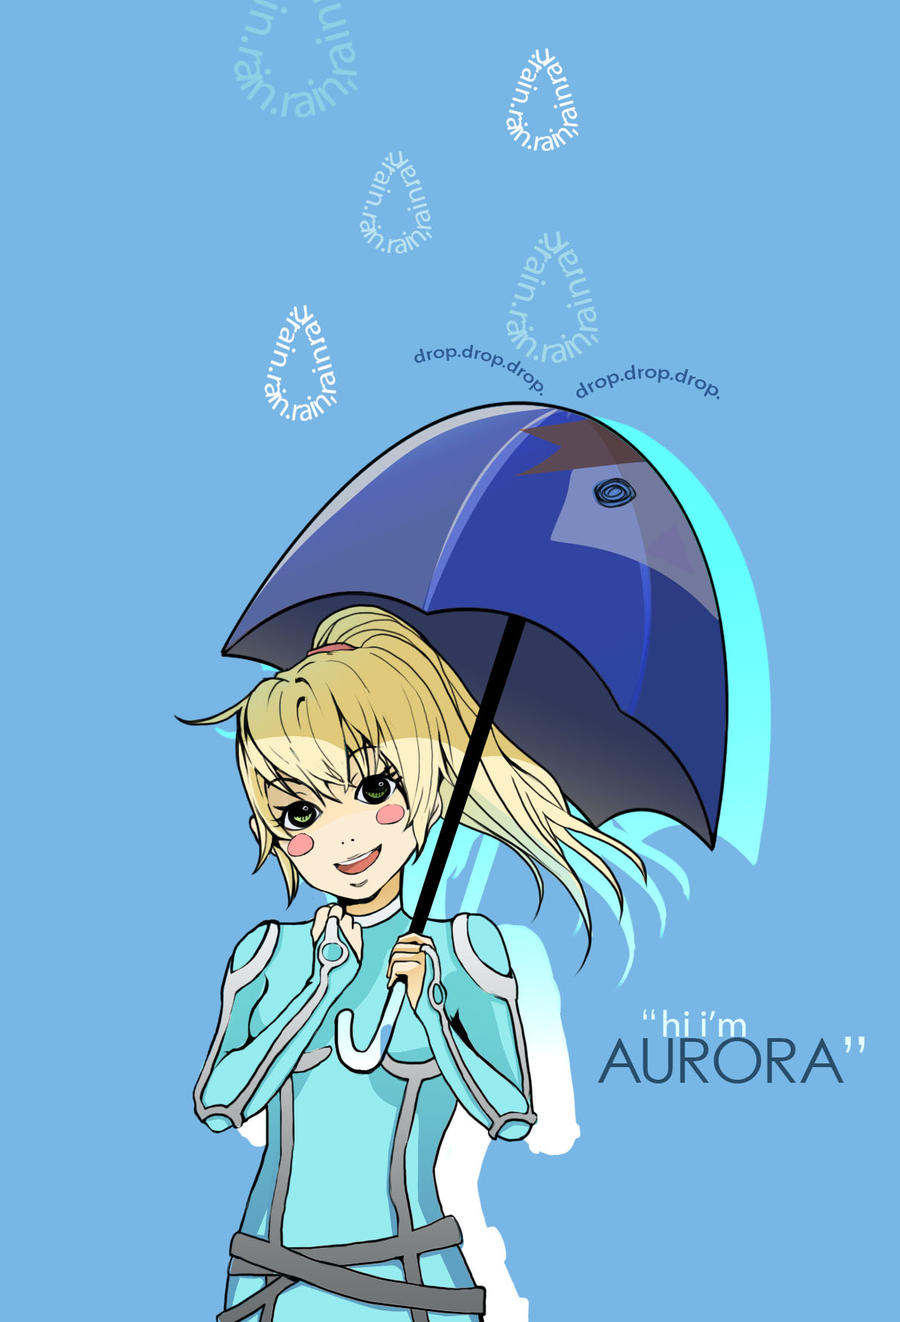 Aurora by Keirin